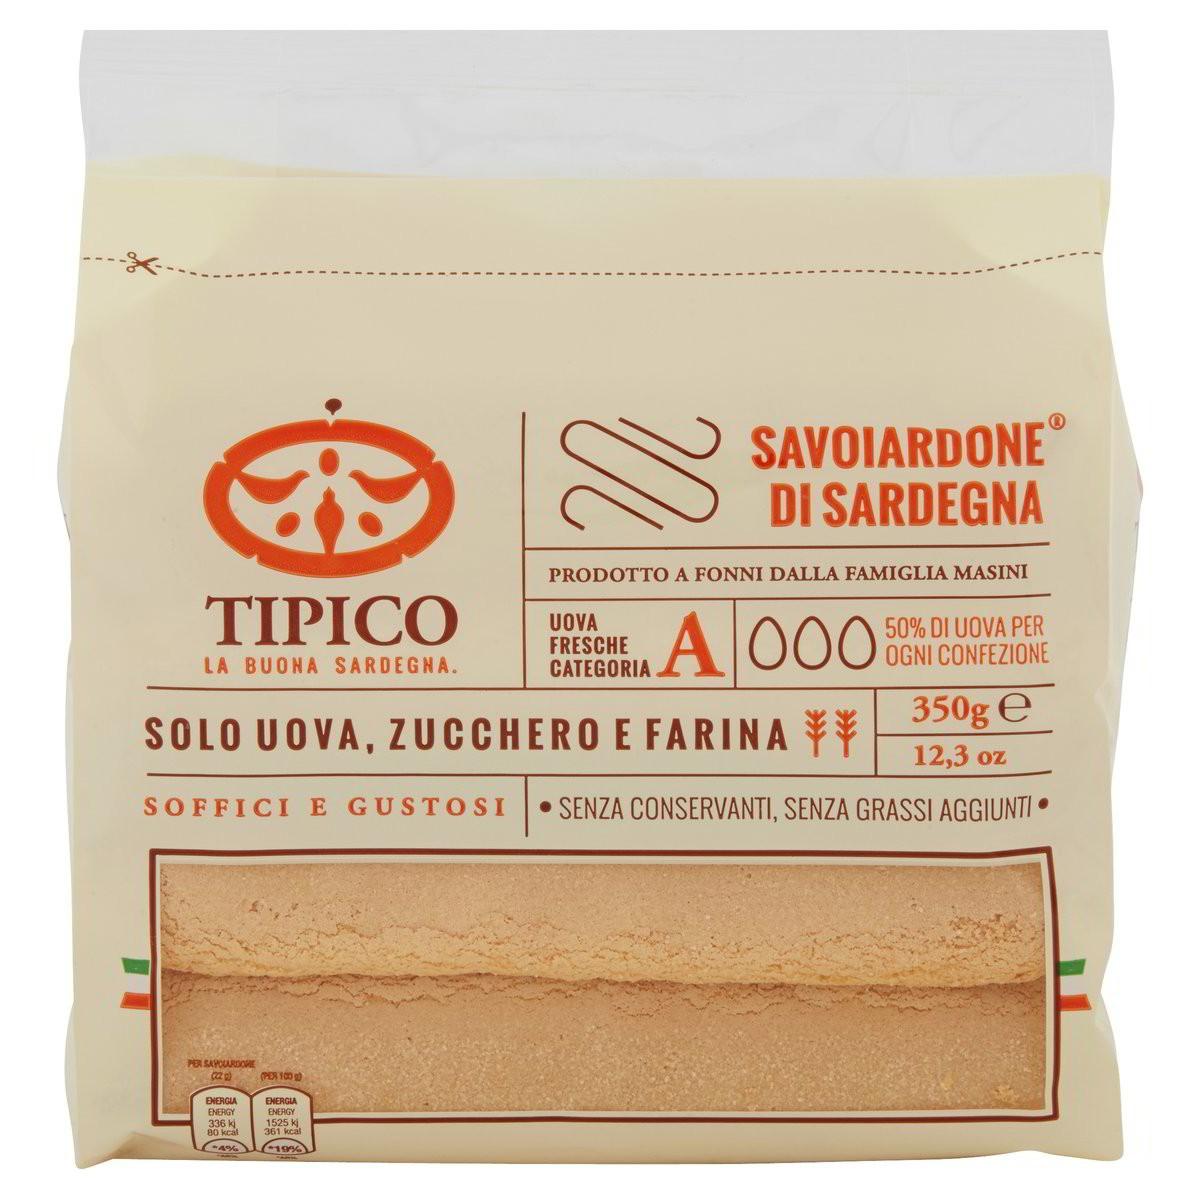 Savoiardone Di Sardegna